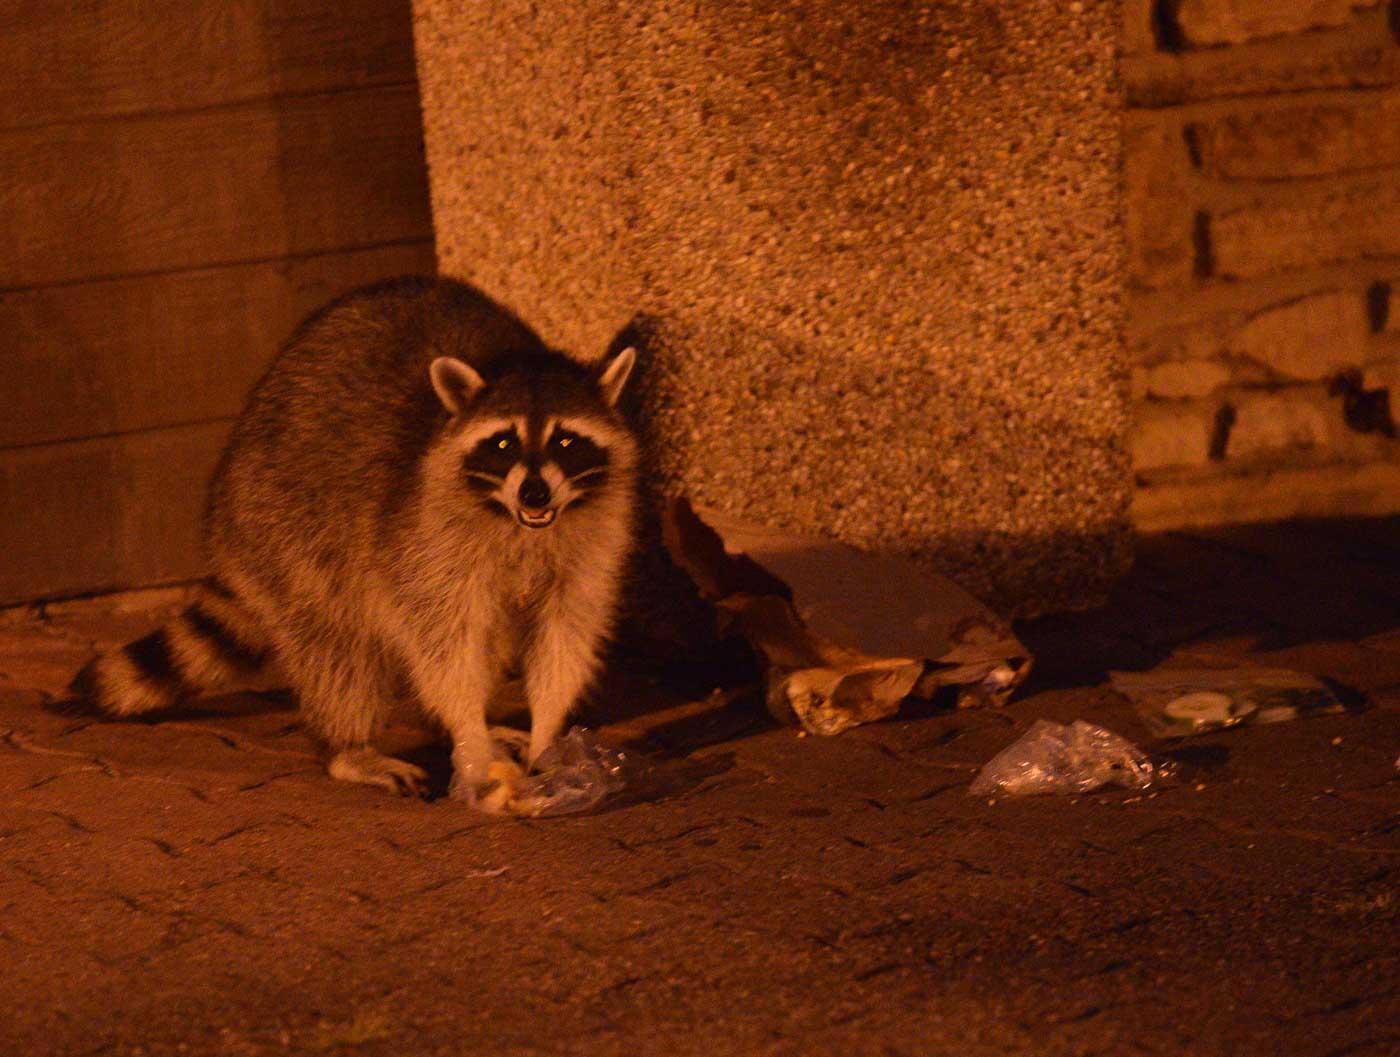 Meet \'Rocky,\' the Riverwalk Raccoon - Positively Naperville